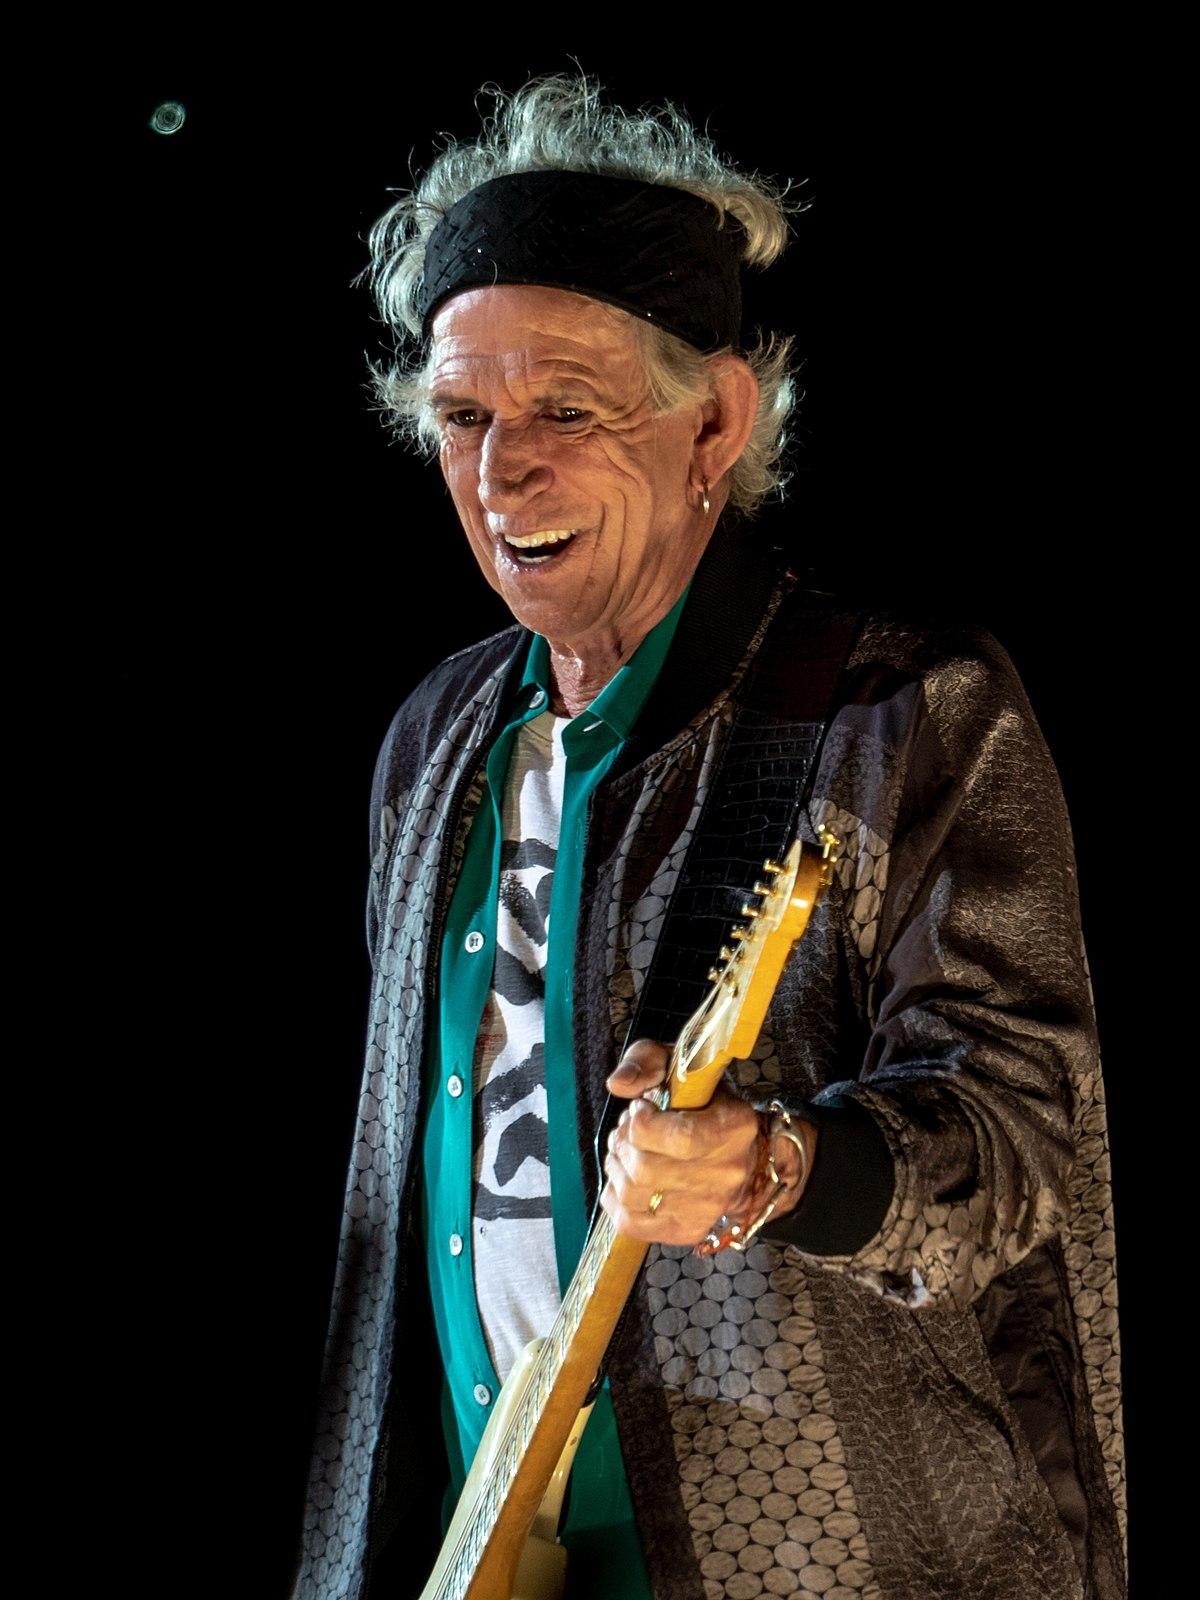 Keith Richards – Wikipedia